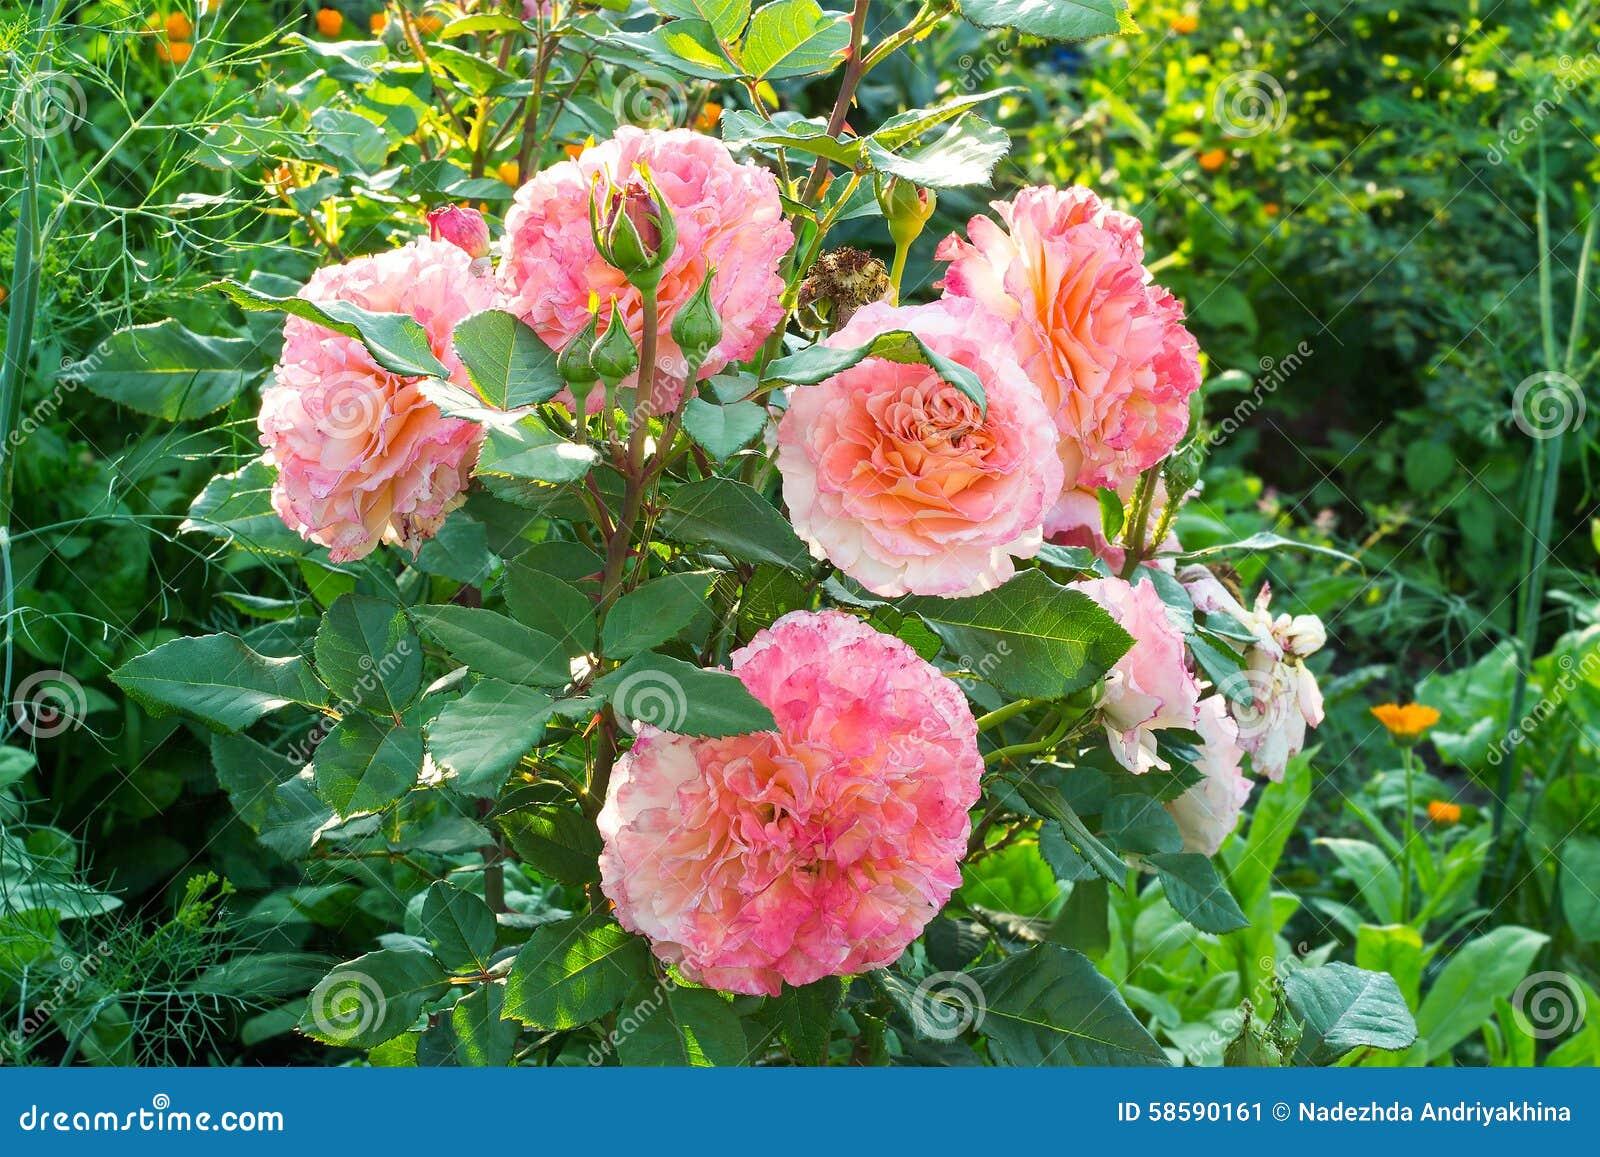 roses d 39 arbuste avec les fleurs roses luxuriantes photo stock image 58590161. Black Bedroom Furniture Sets. Home Design Ideas